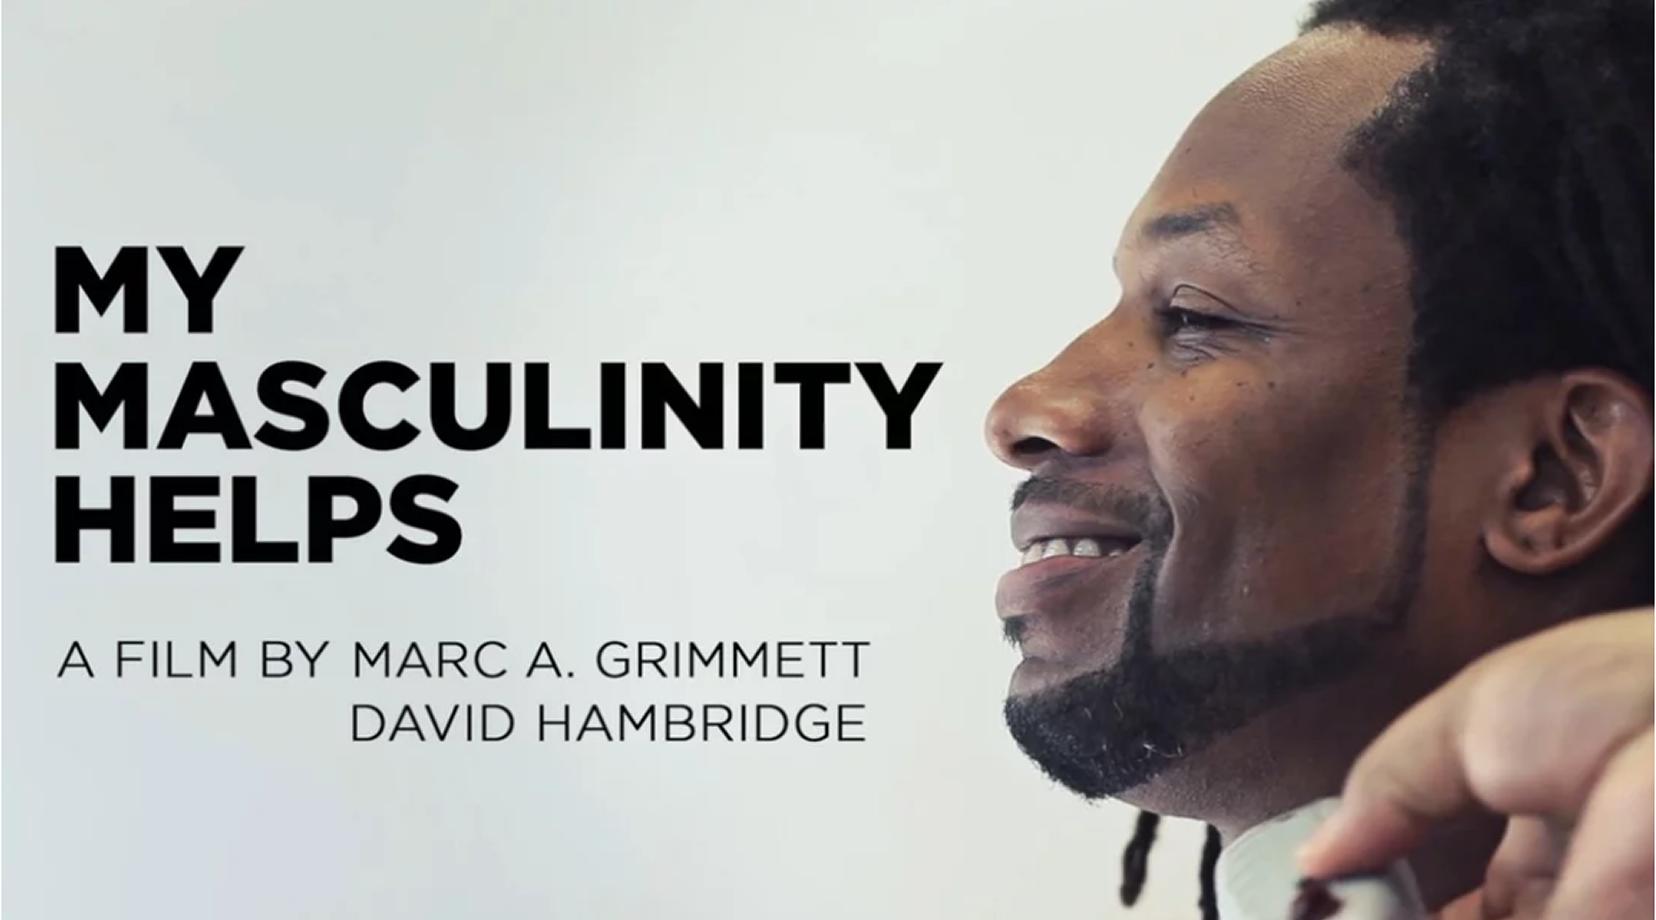 Documentary film presentation of 'My Masculinity Helps'